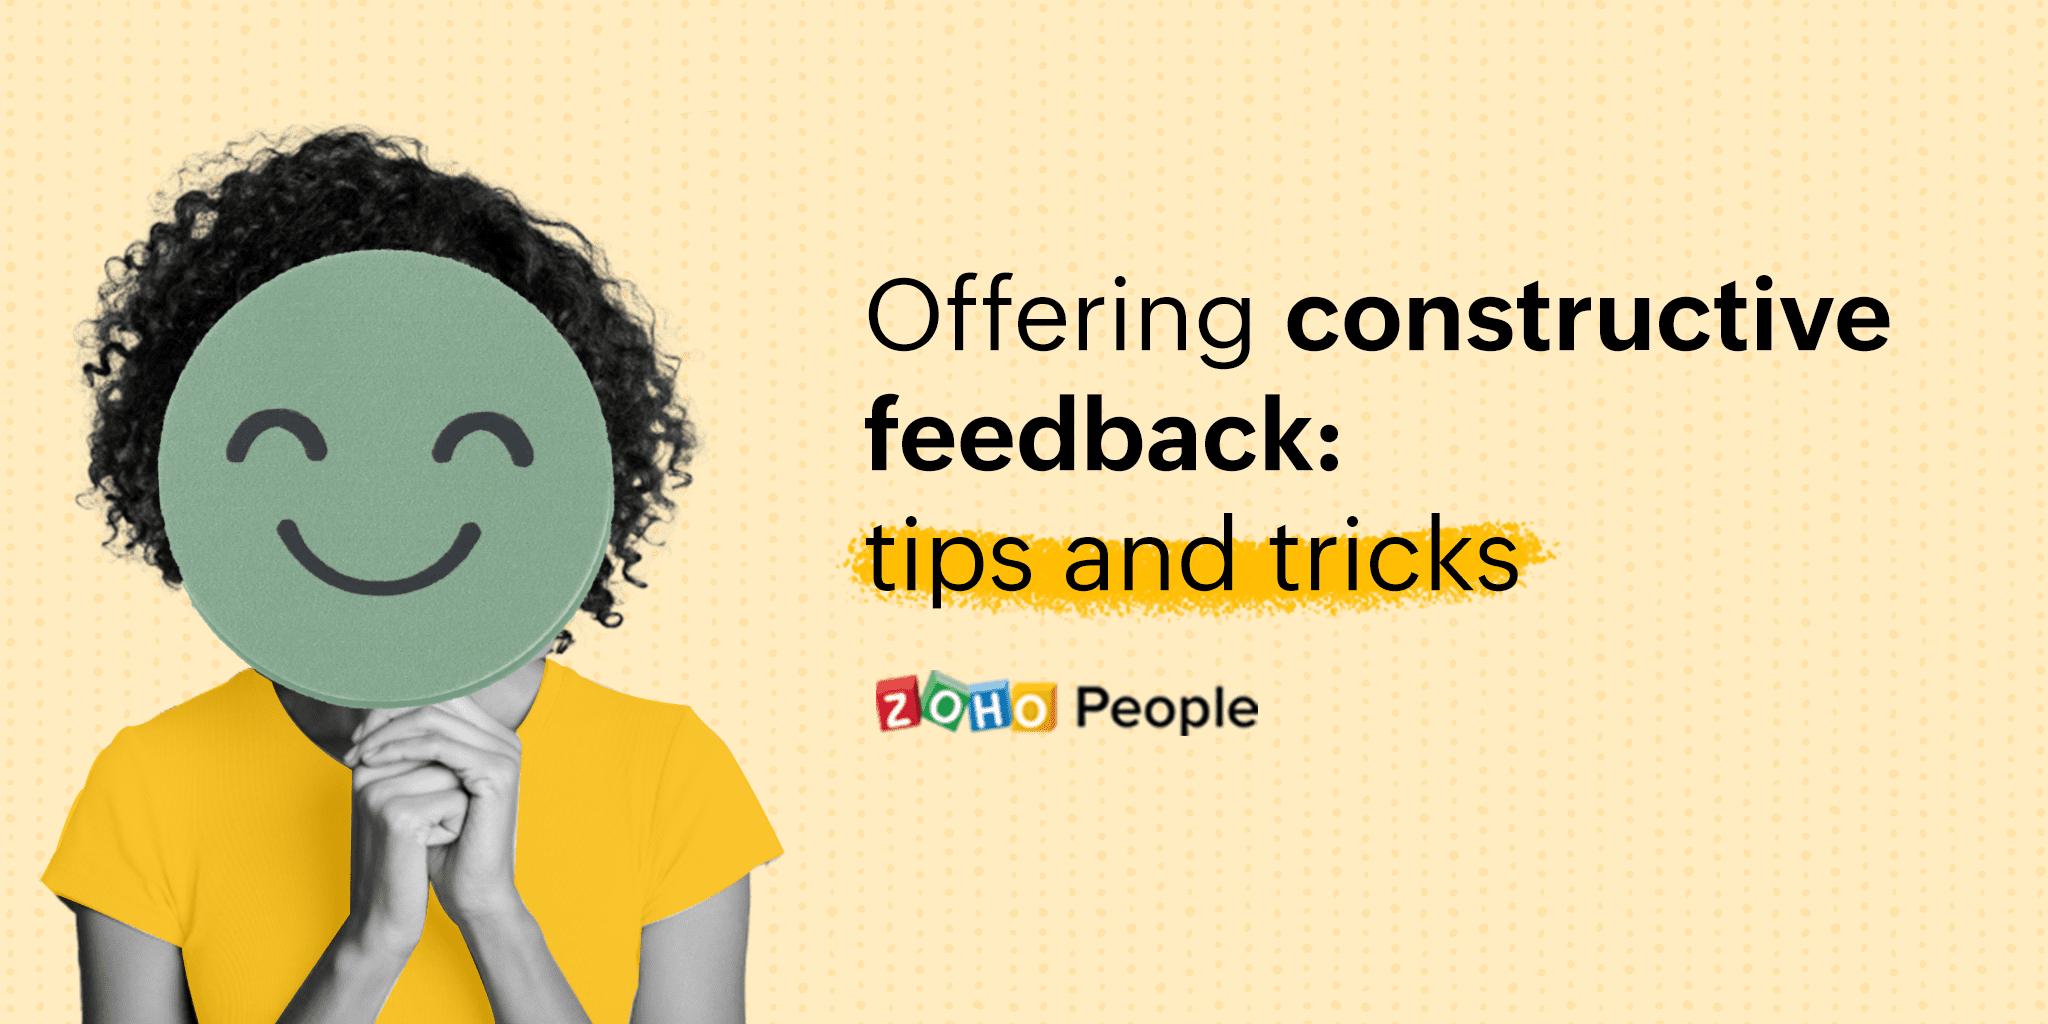 Tips to provide Constructive Feedback